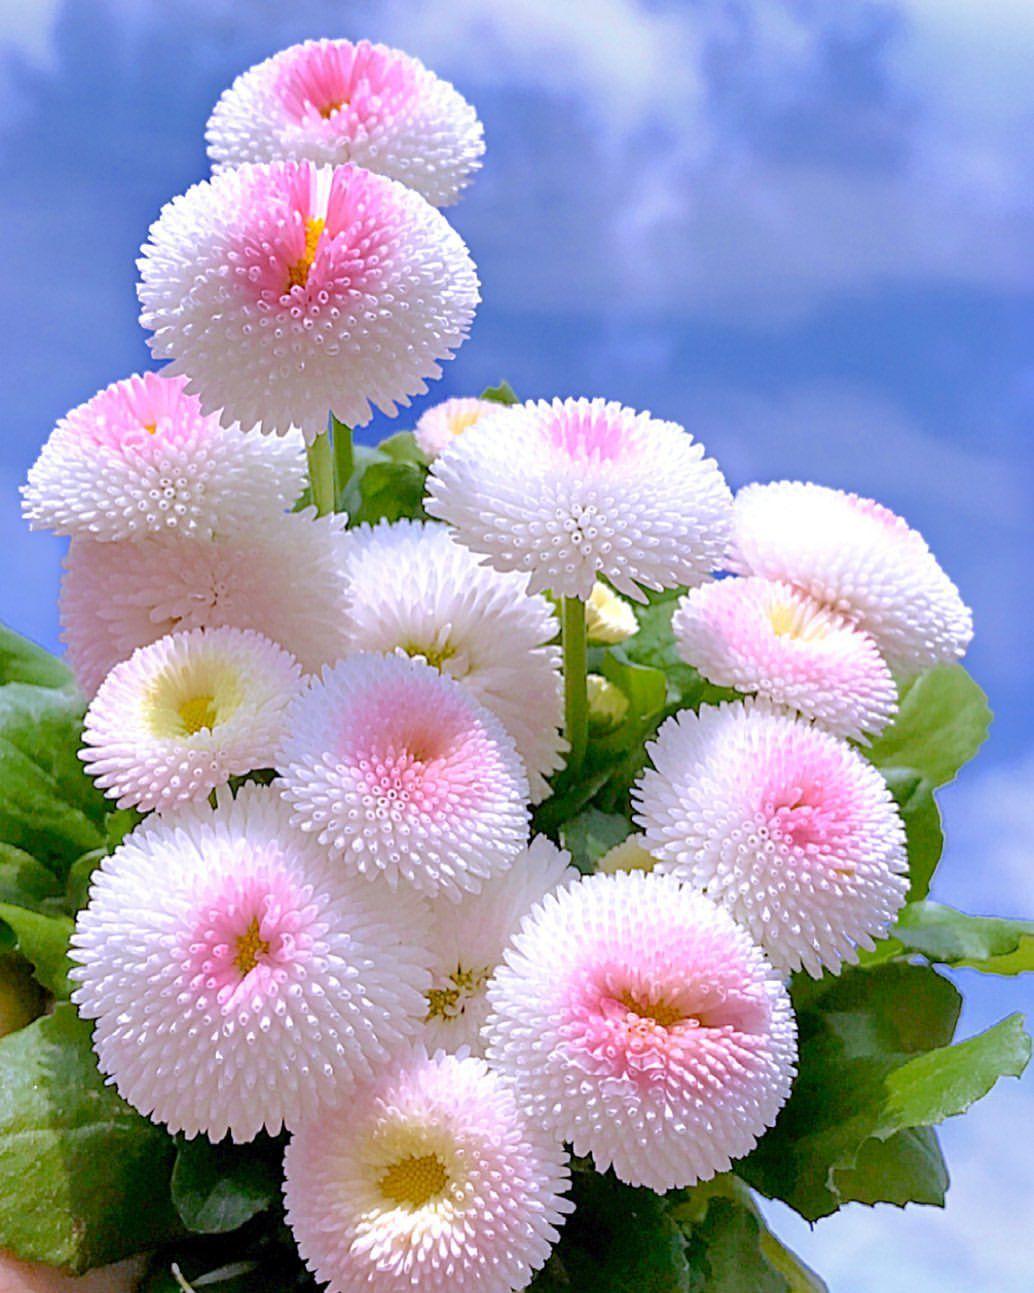 Beautiful Flower Let Us Feel The Beauty Of Life | Beautiful flowers garden,  Beautiful rose flowers, Beautiful flowers wallpapers